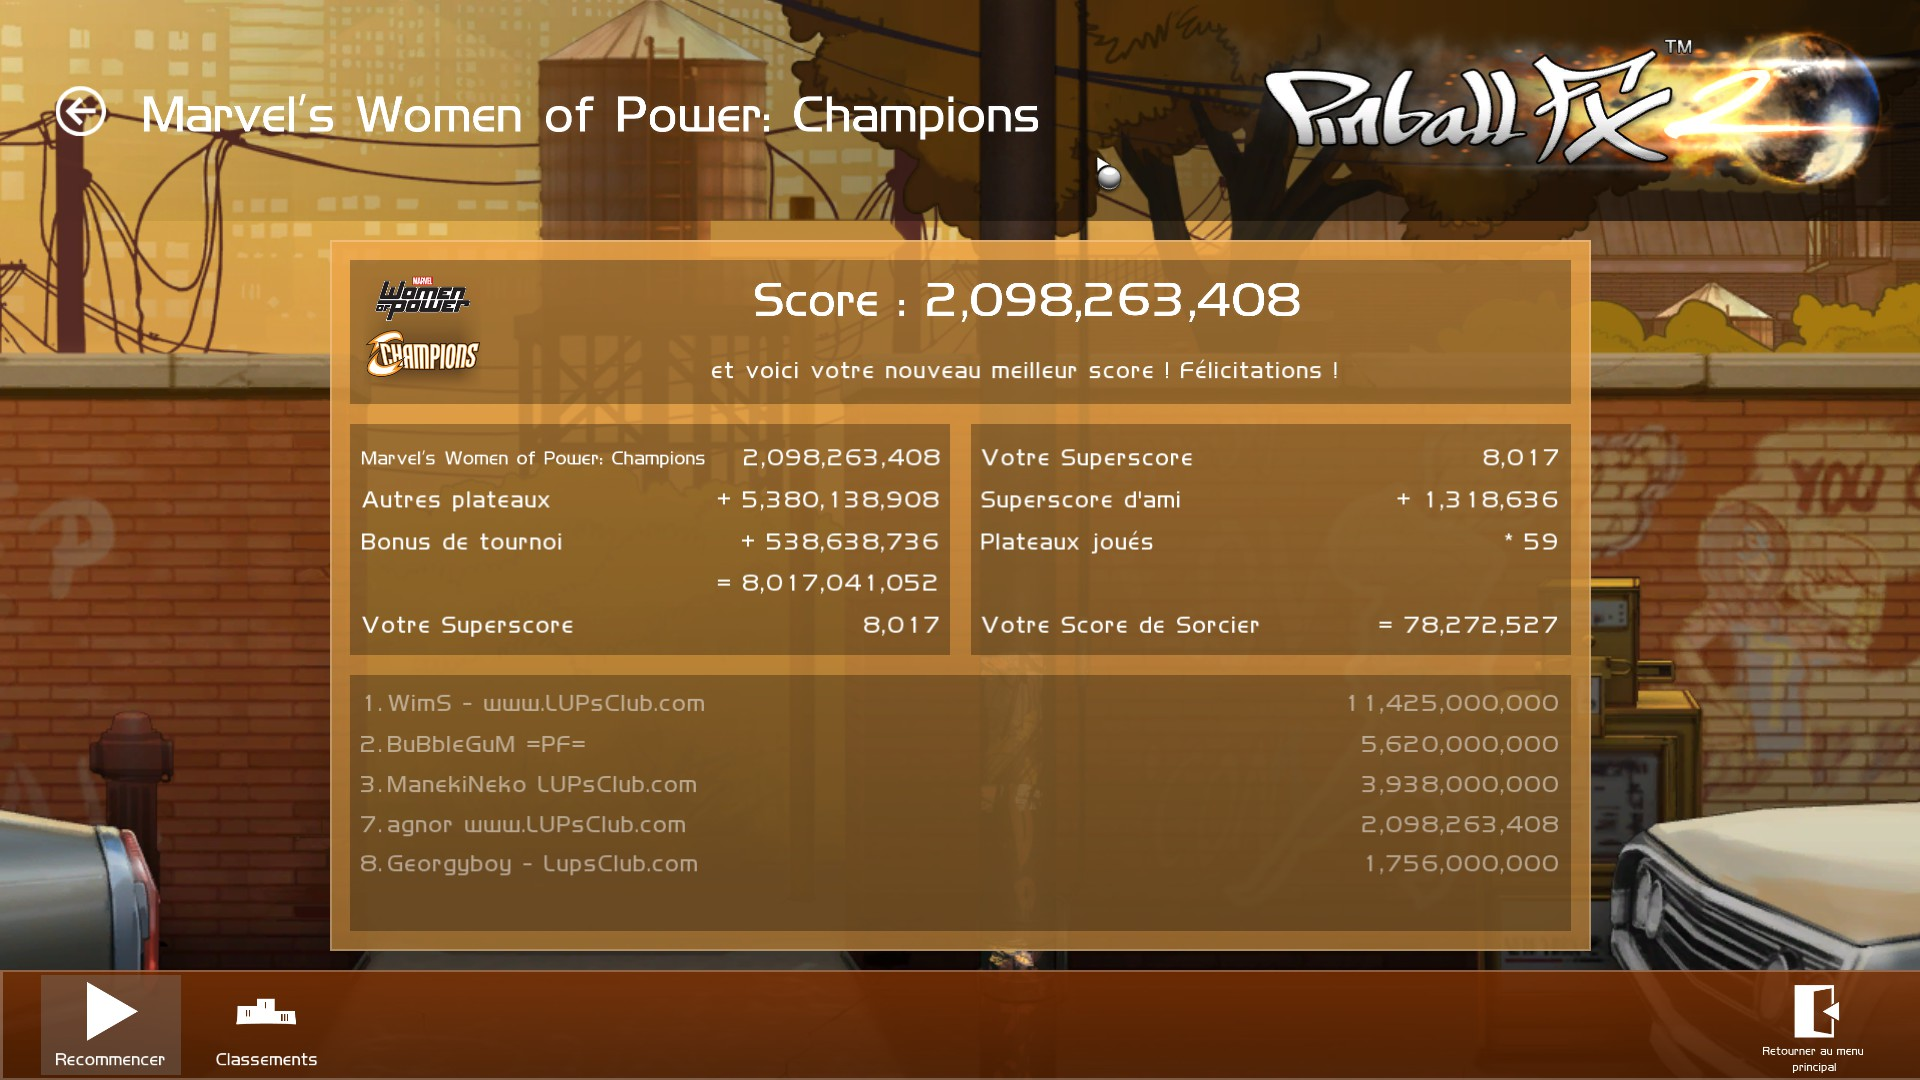 LUP's Club TdM 05.17 : Champions - Page 2 2583925DF605A1ED6945F647B52C71115AAFCEE0